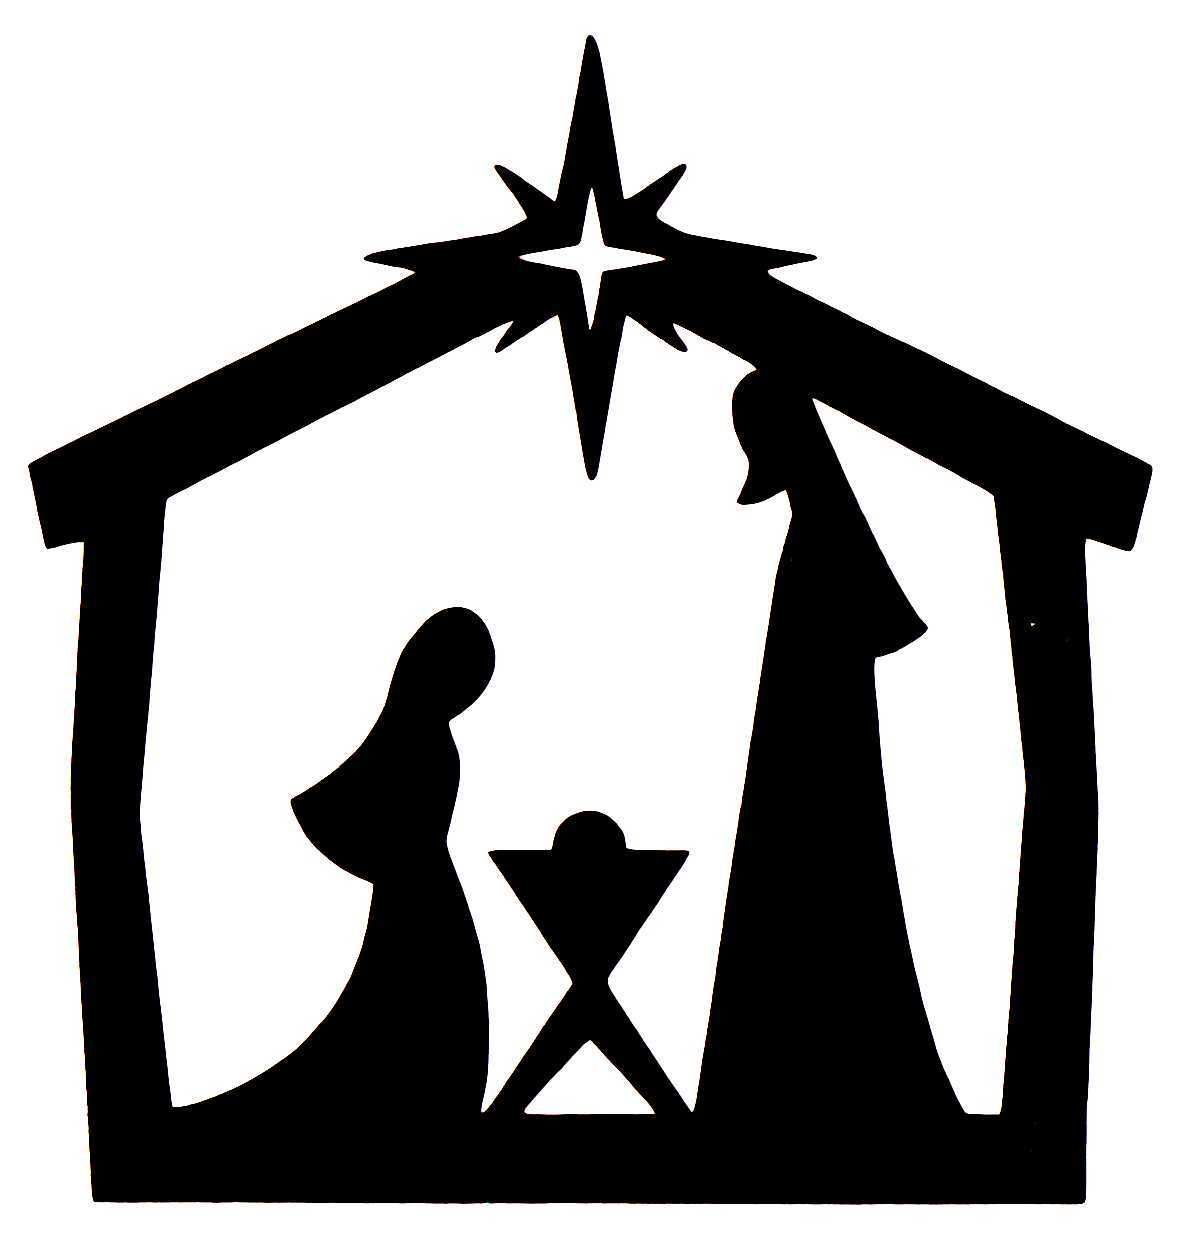 1182x1239 10 X Christmas Die Cut Nativity Silhouettes In Black Nativity